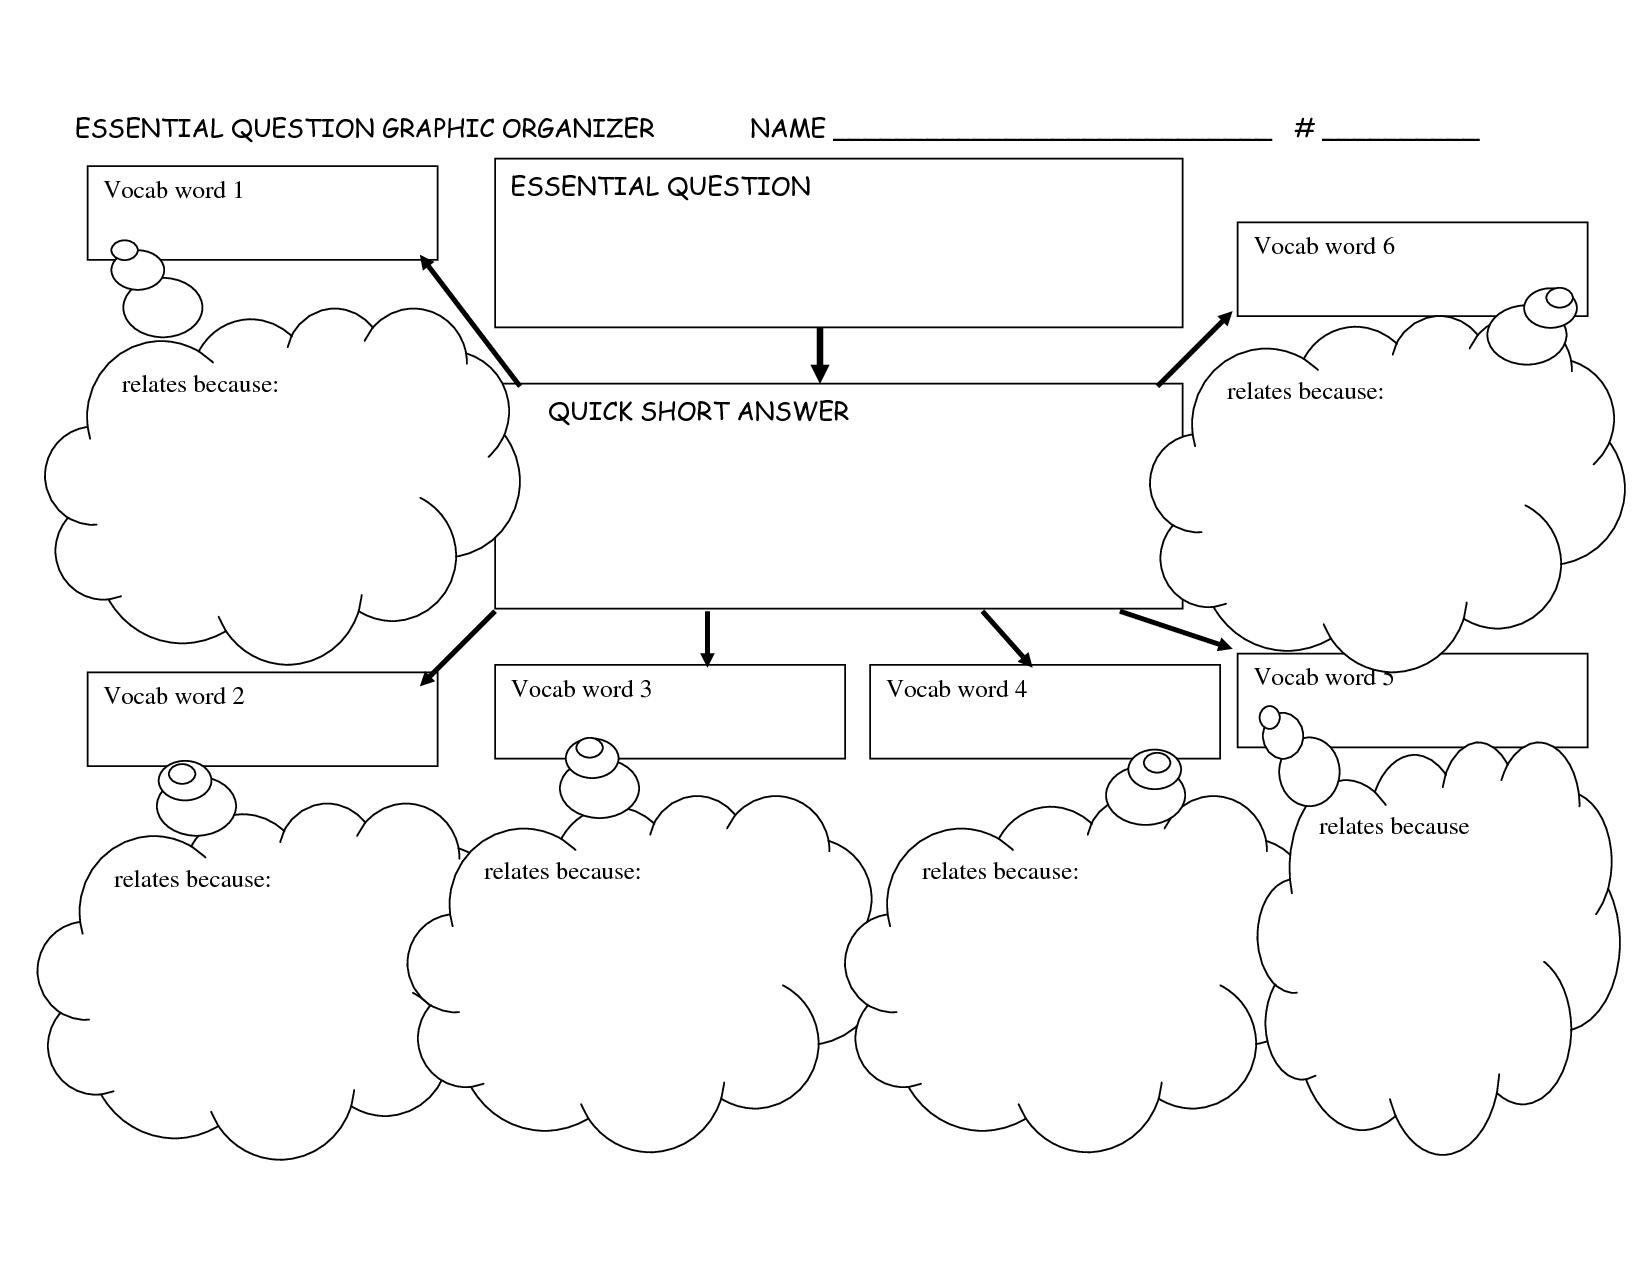 Question Web Graphic Organizer